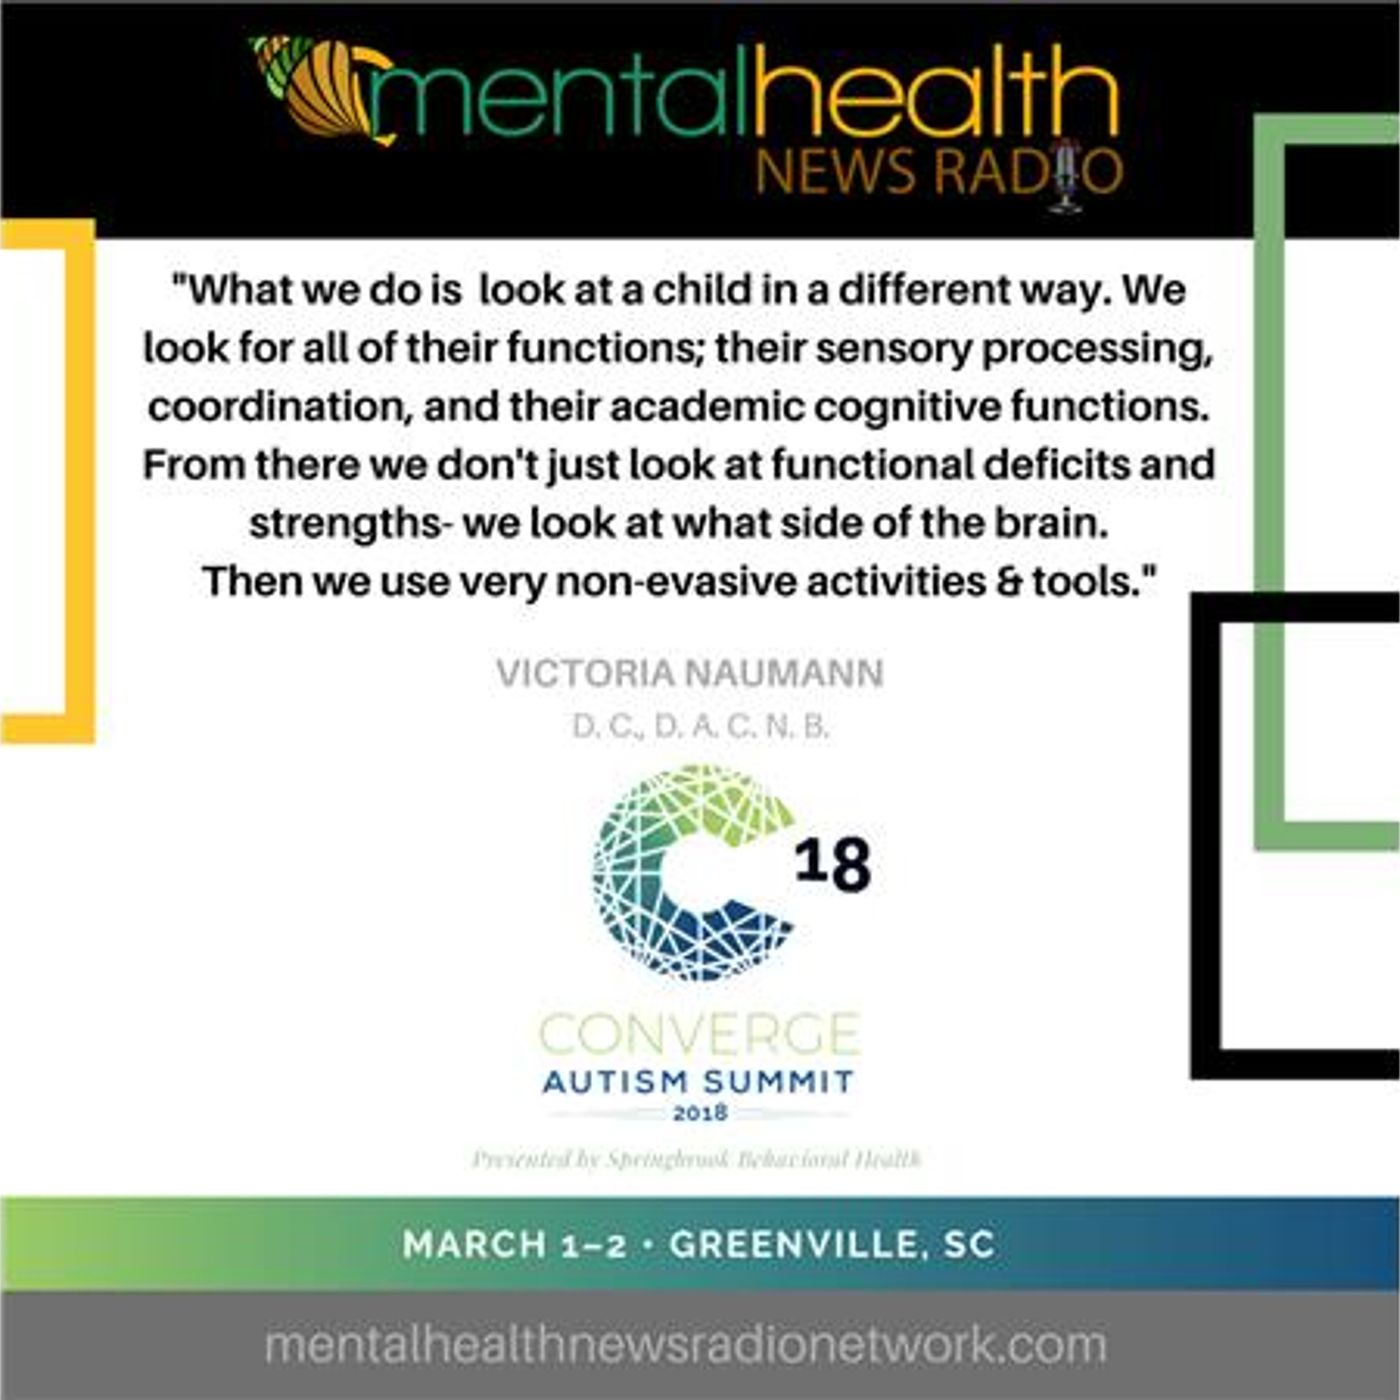 Mental Health News Radio - Brain Balance: Creating Synergy in the Brains of Autistic Children